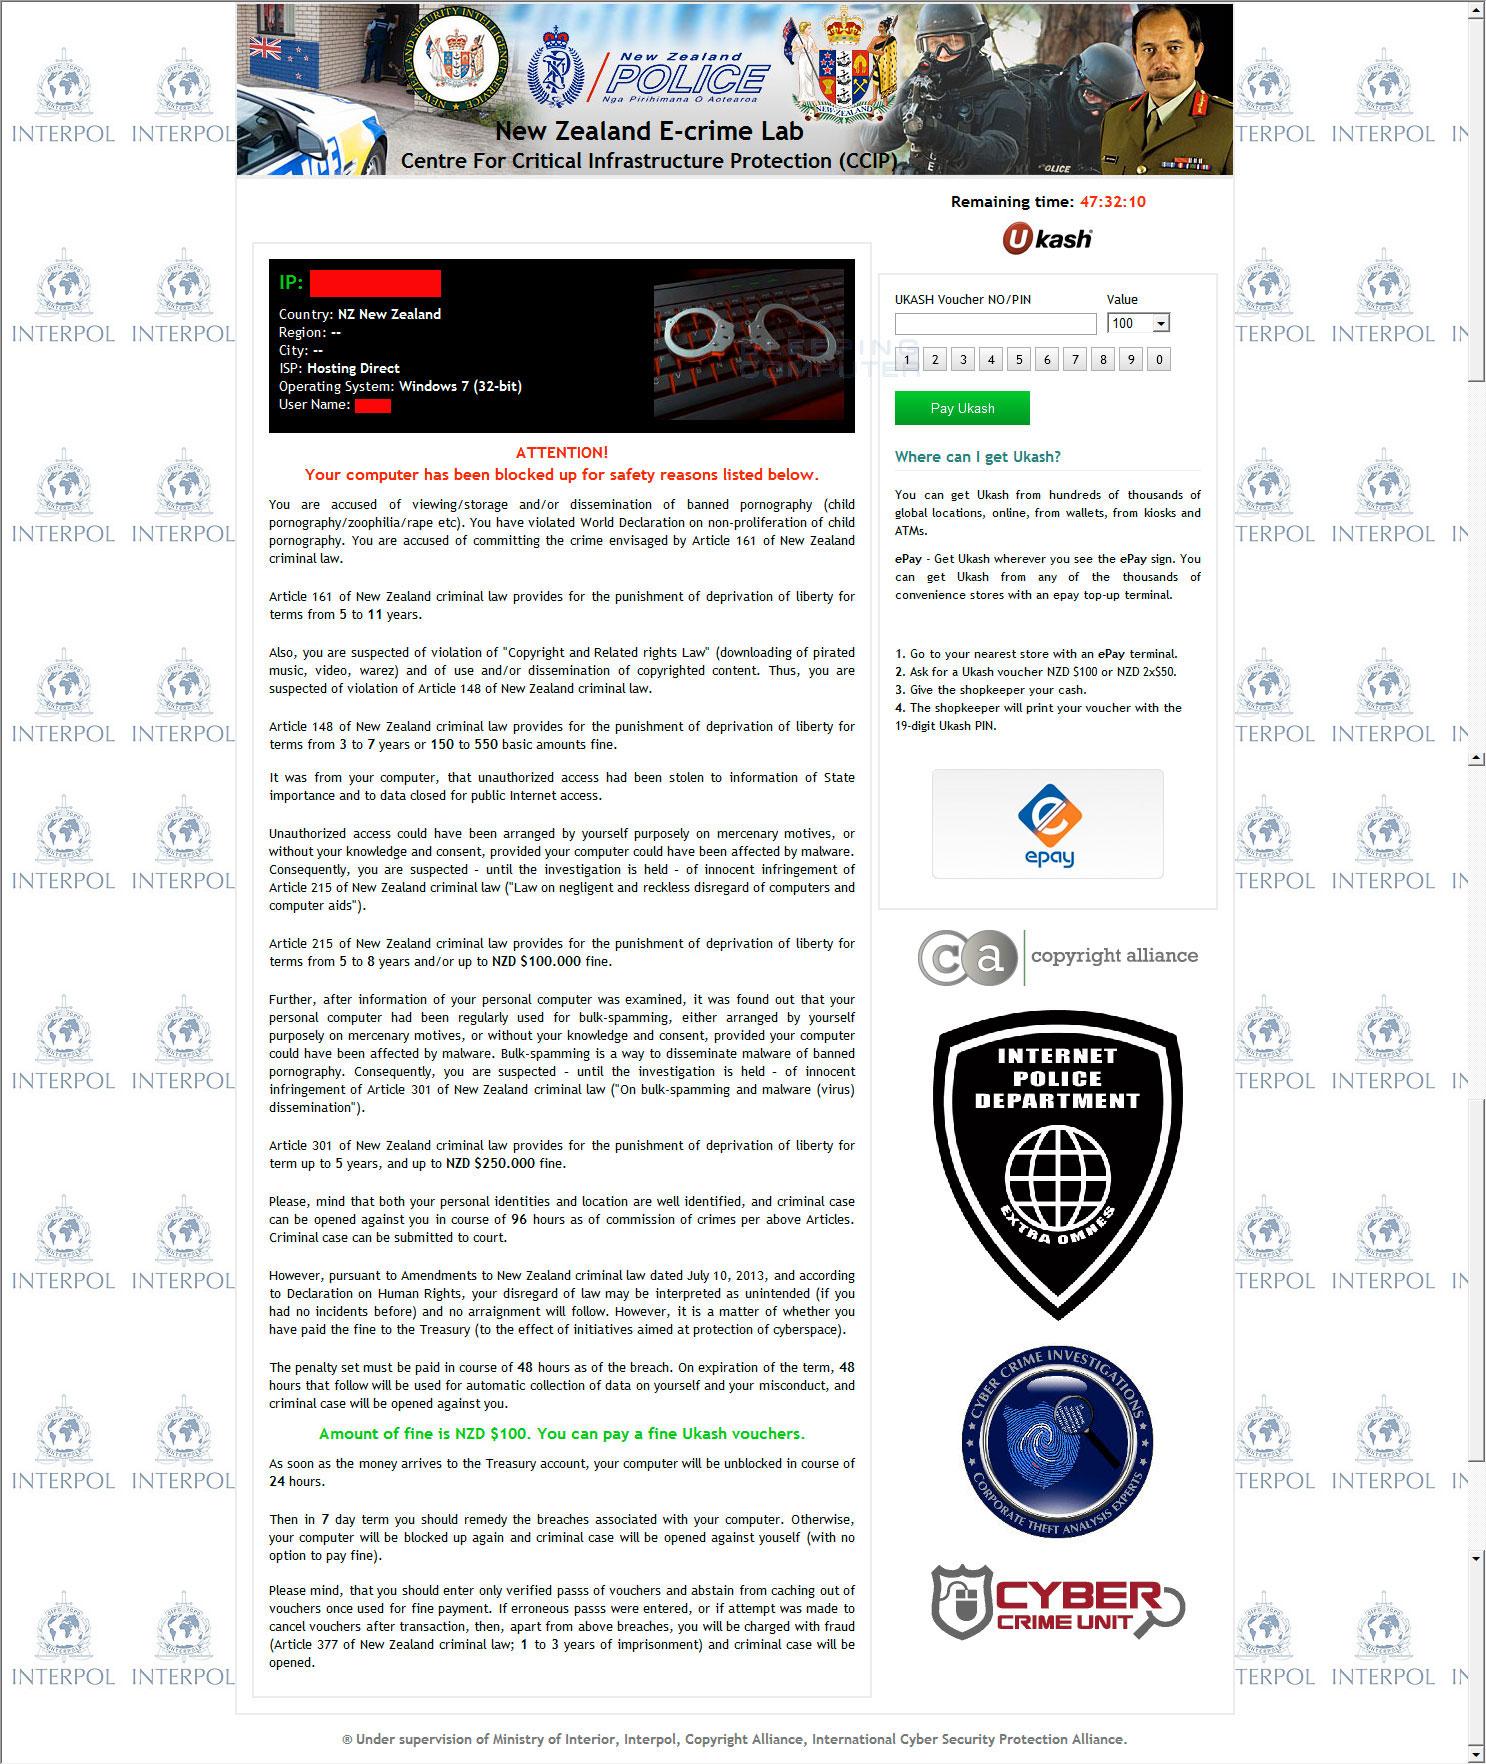 New Zealand E-Crime Lab Ransomware screen shot